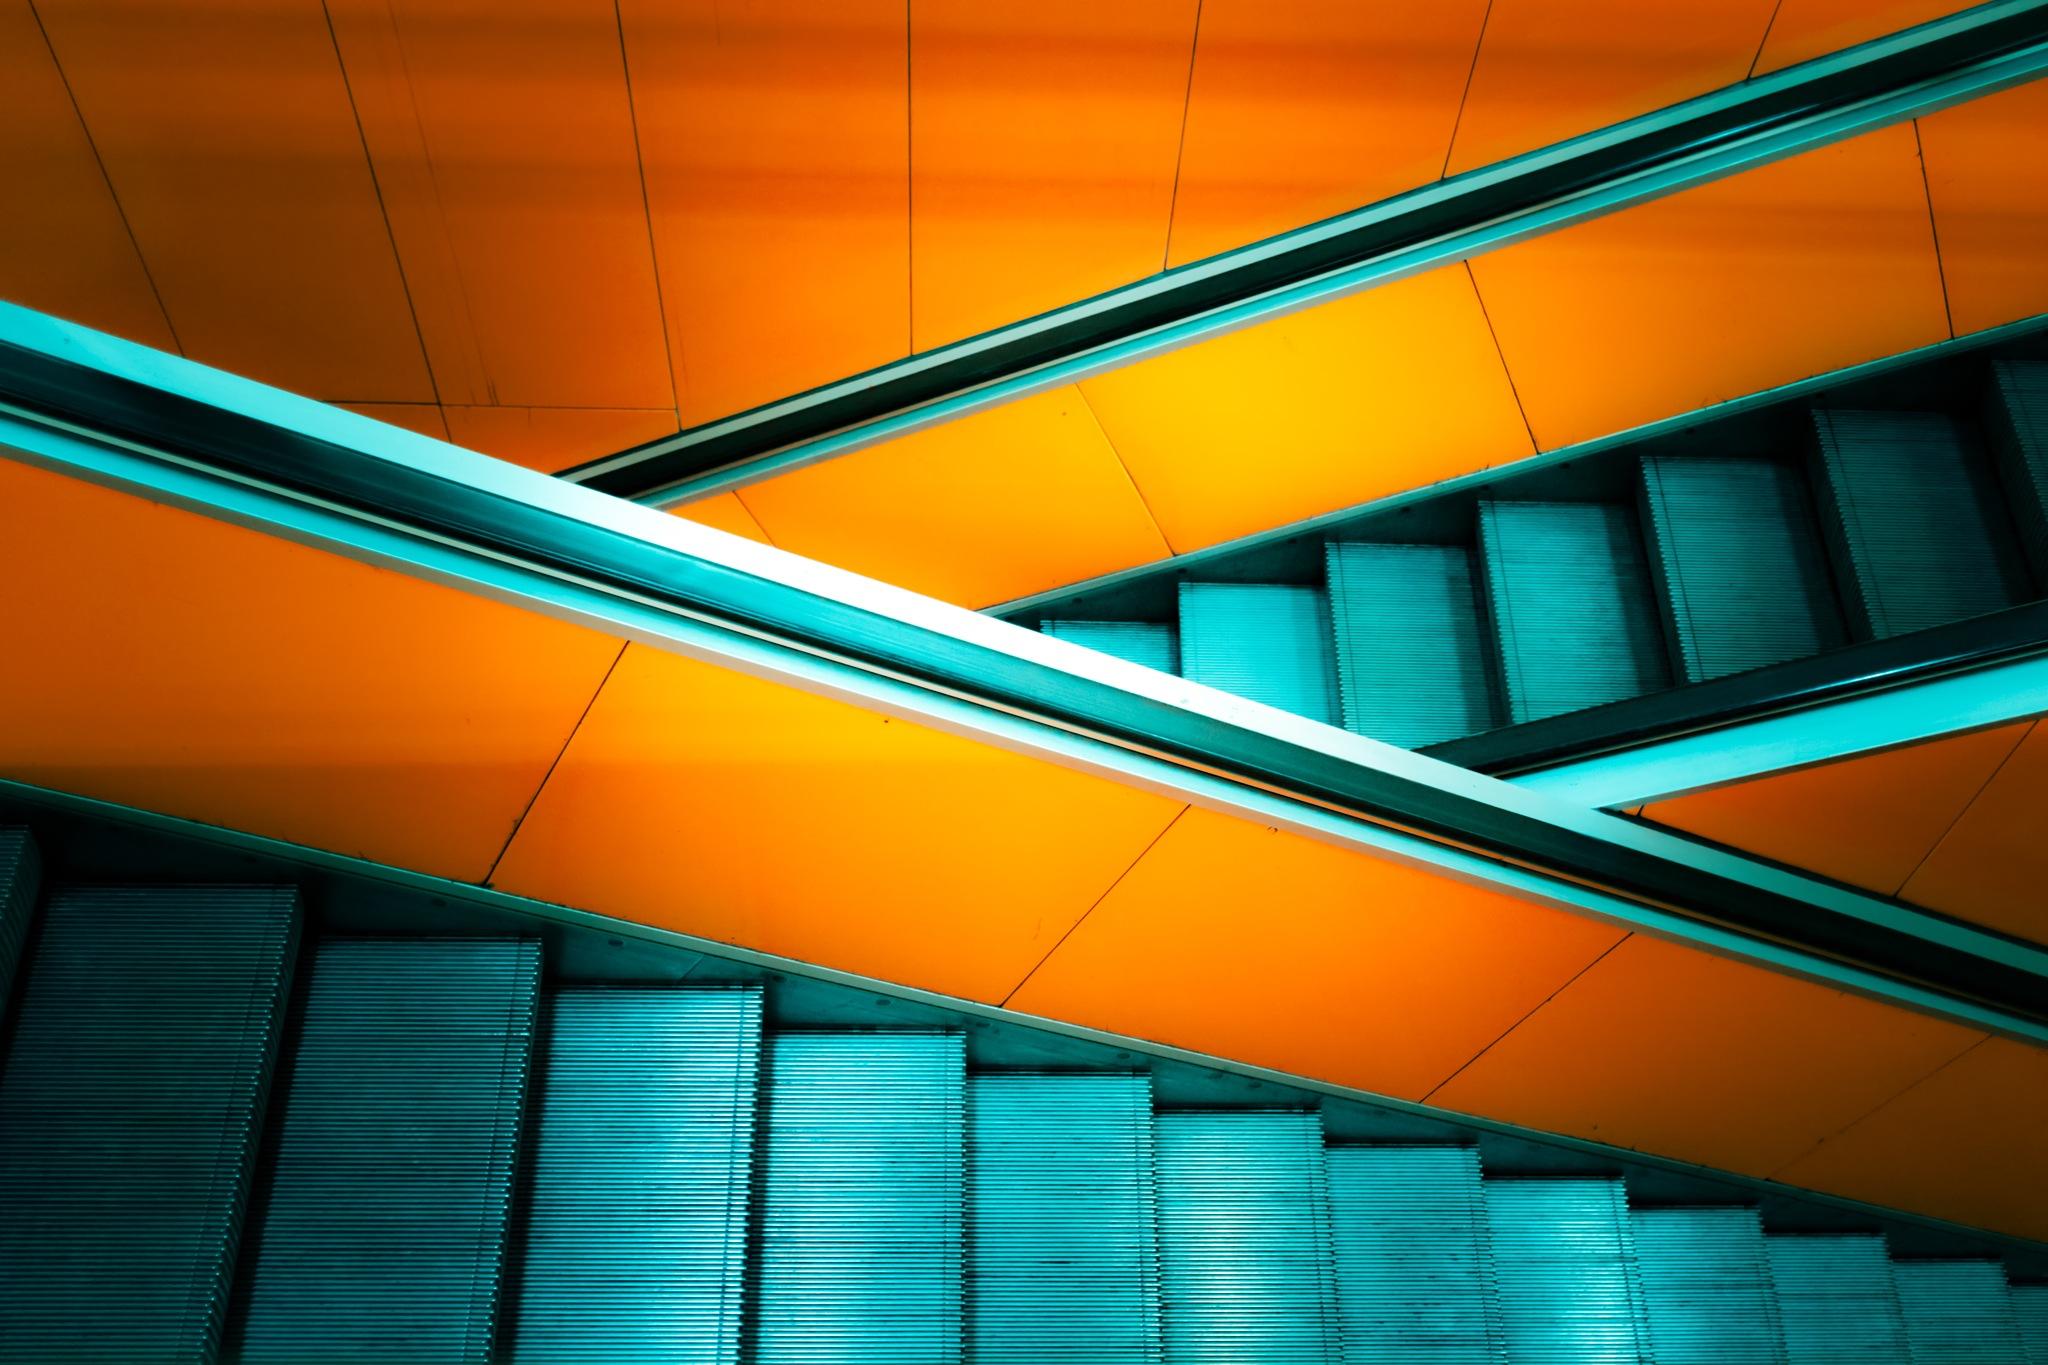 Orange an Teal Escalator by André Eikmeyer